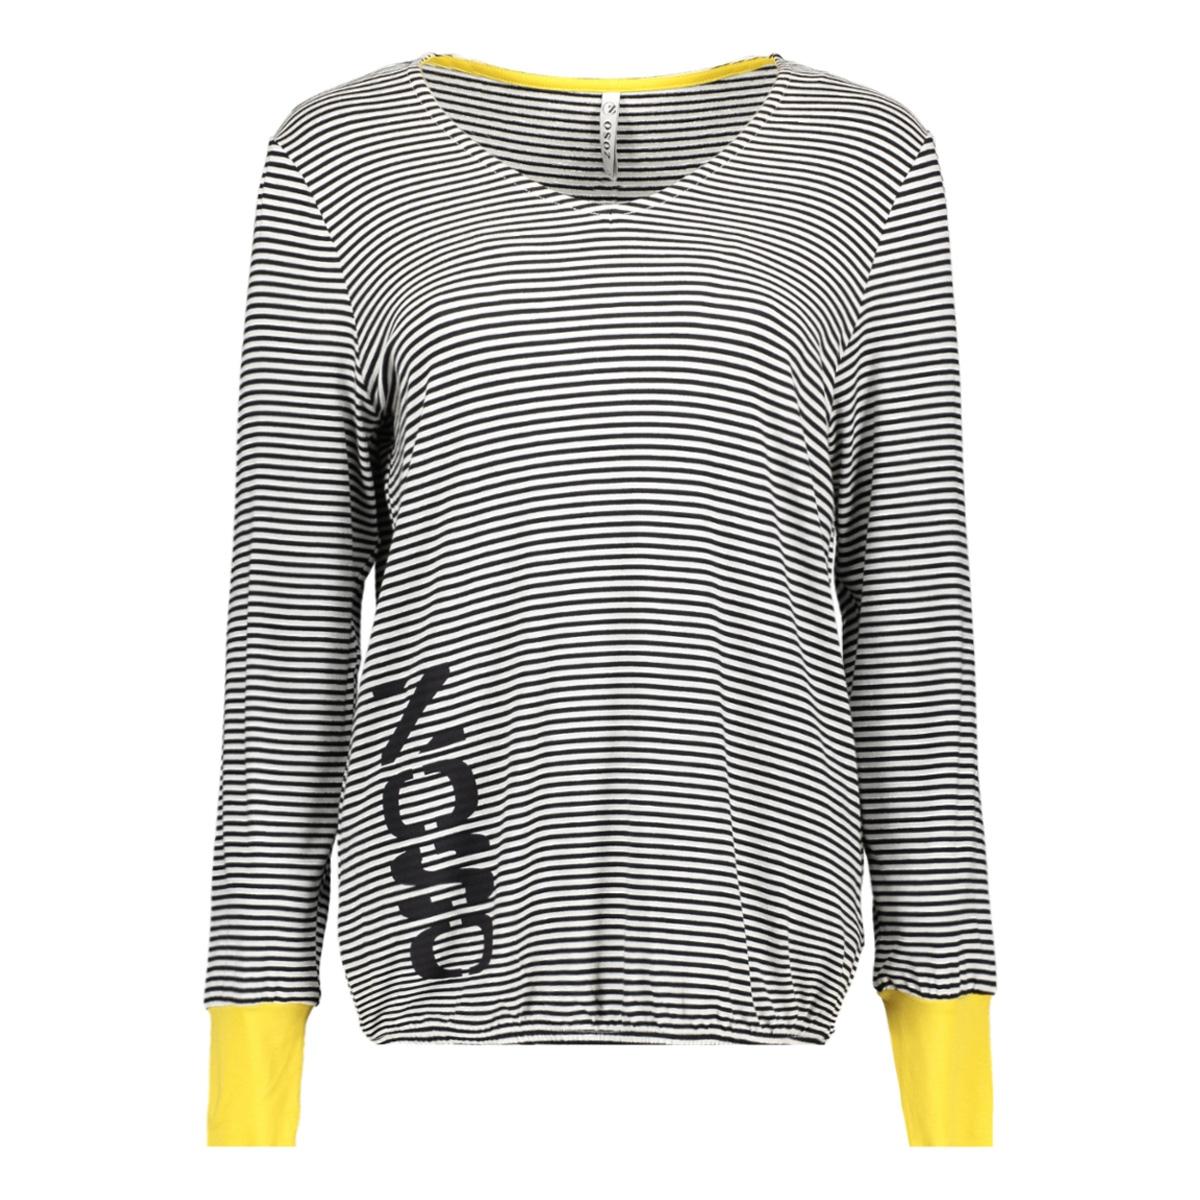 ay1912 zoso t-shirt offwhite/yellow